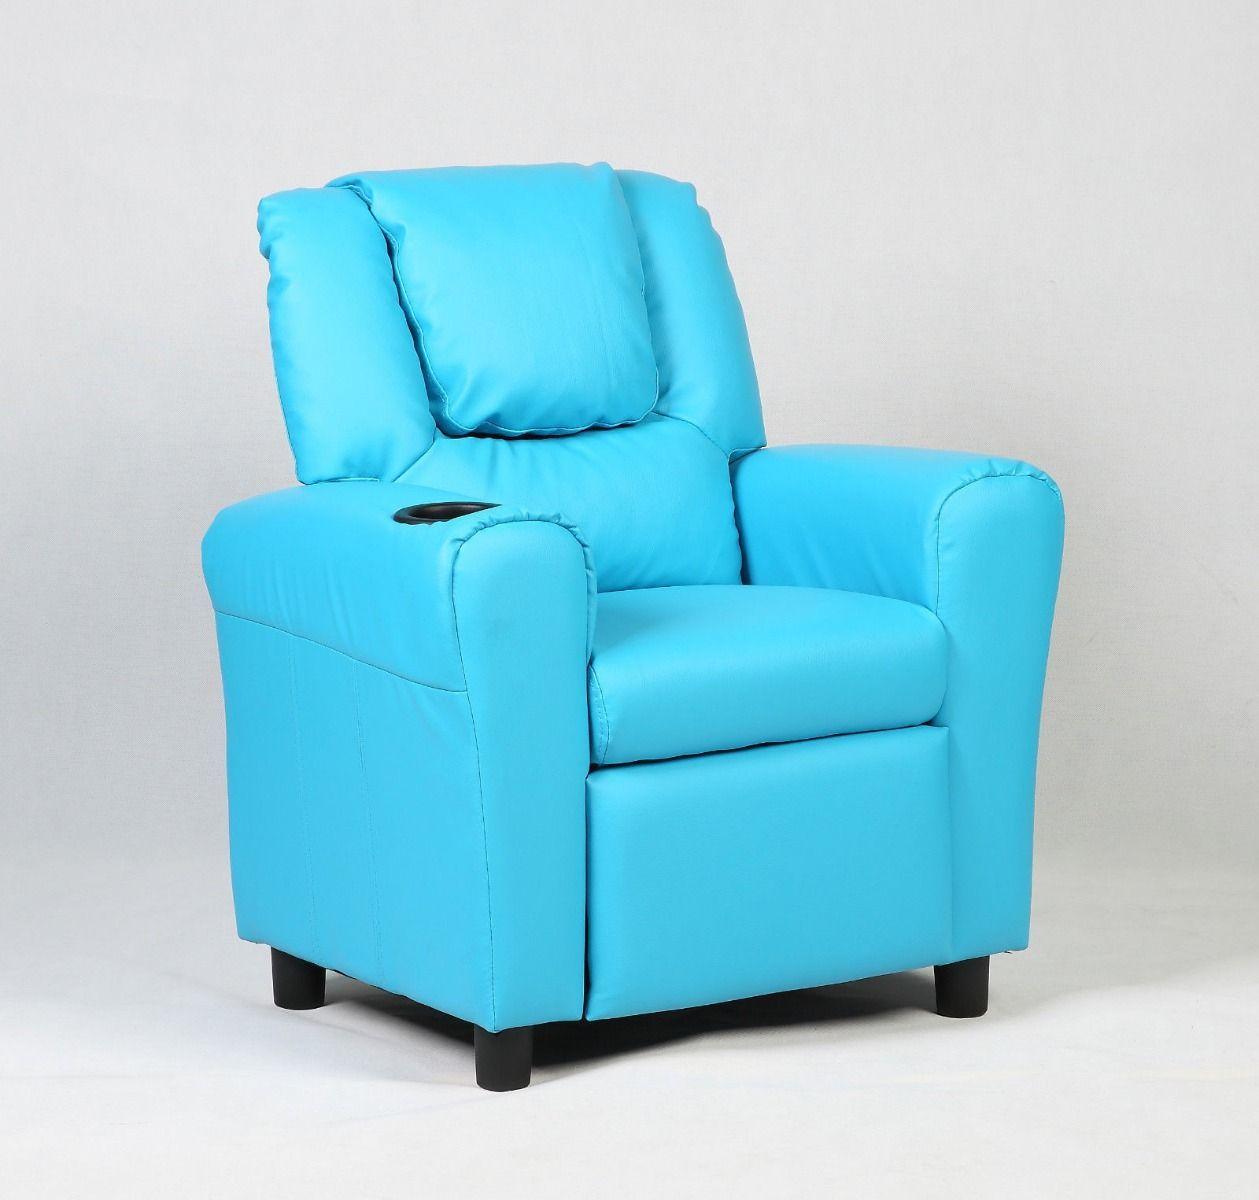 67% OFF #Kids Recliner #Armchair #Sofa | Kids recliners